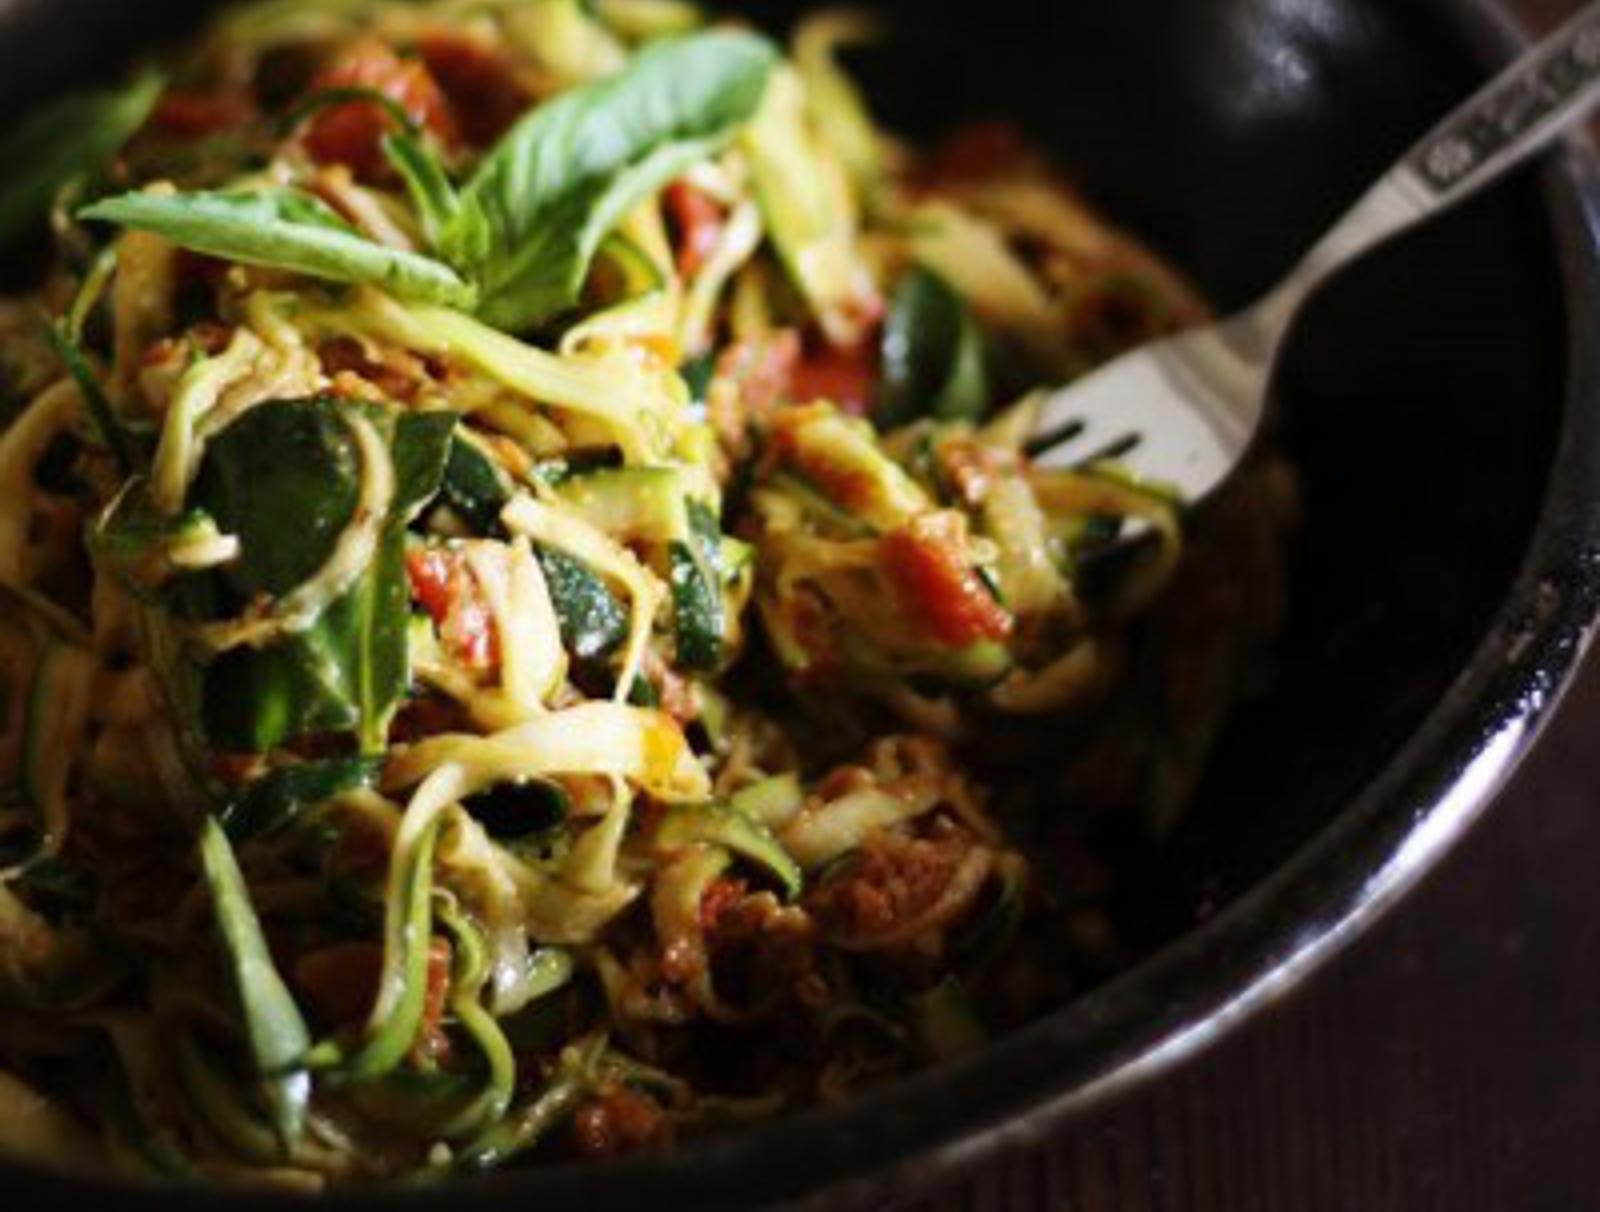 Zucchini Spaghetti With Sun-Dried Tomatoes & Basil